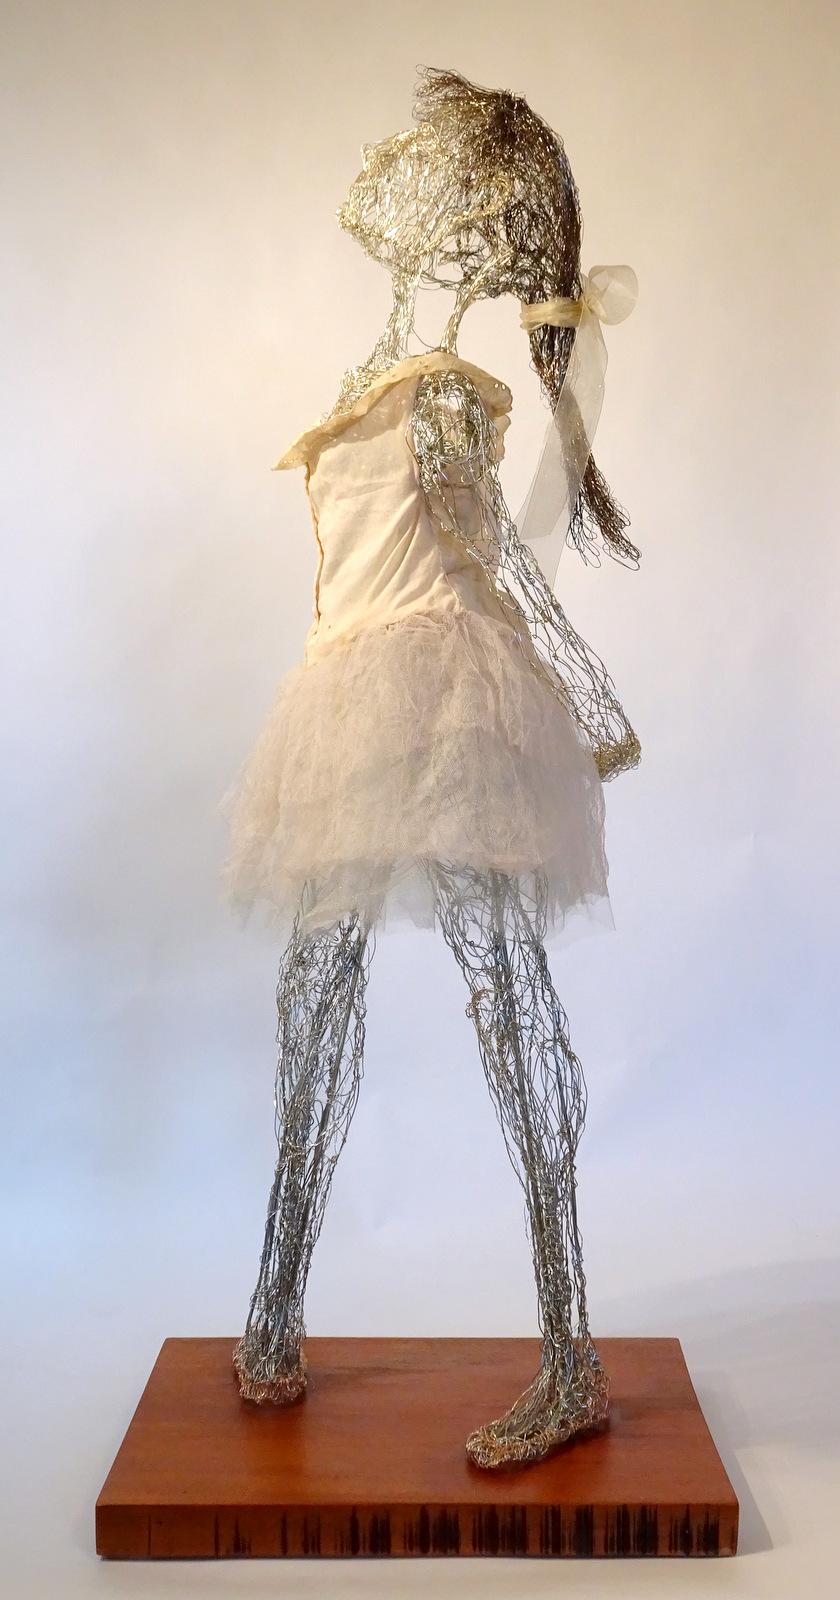 Lois Steele, Wire Sculpture, Fine Art, SVFAL-009.JPG